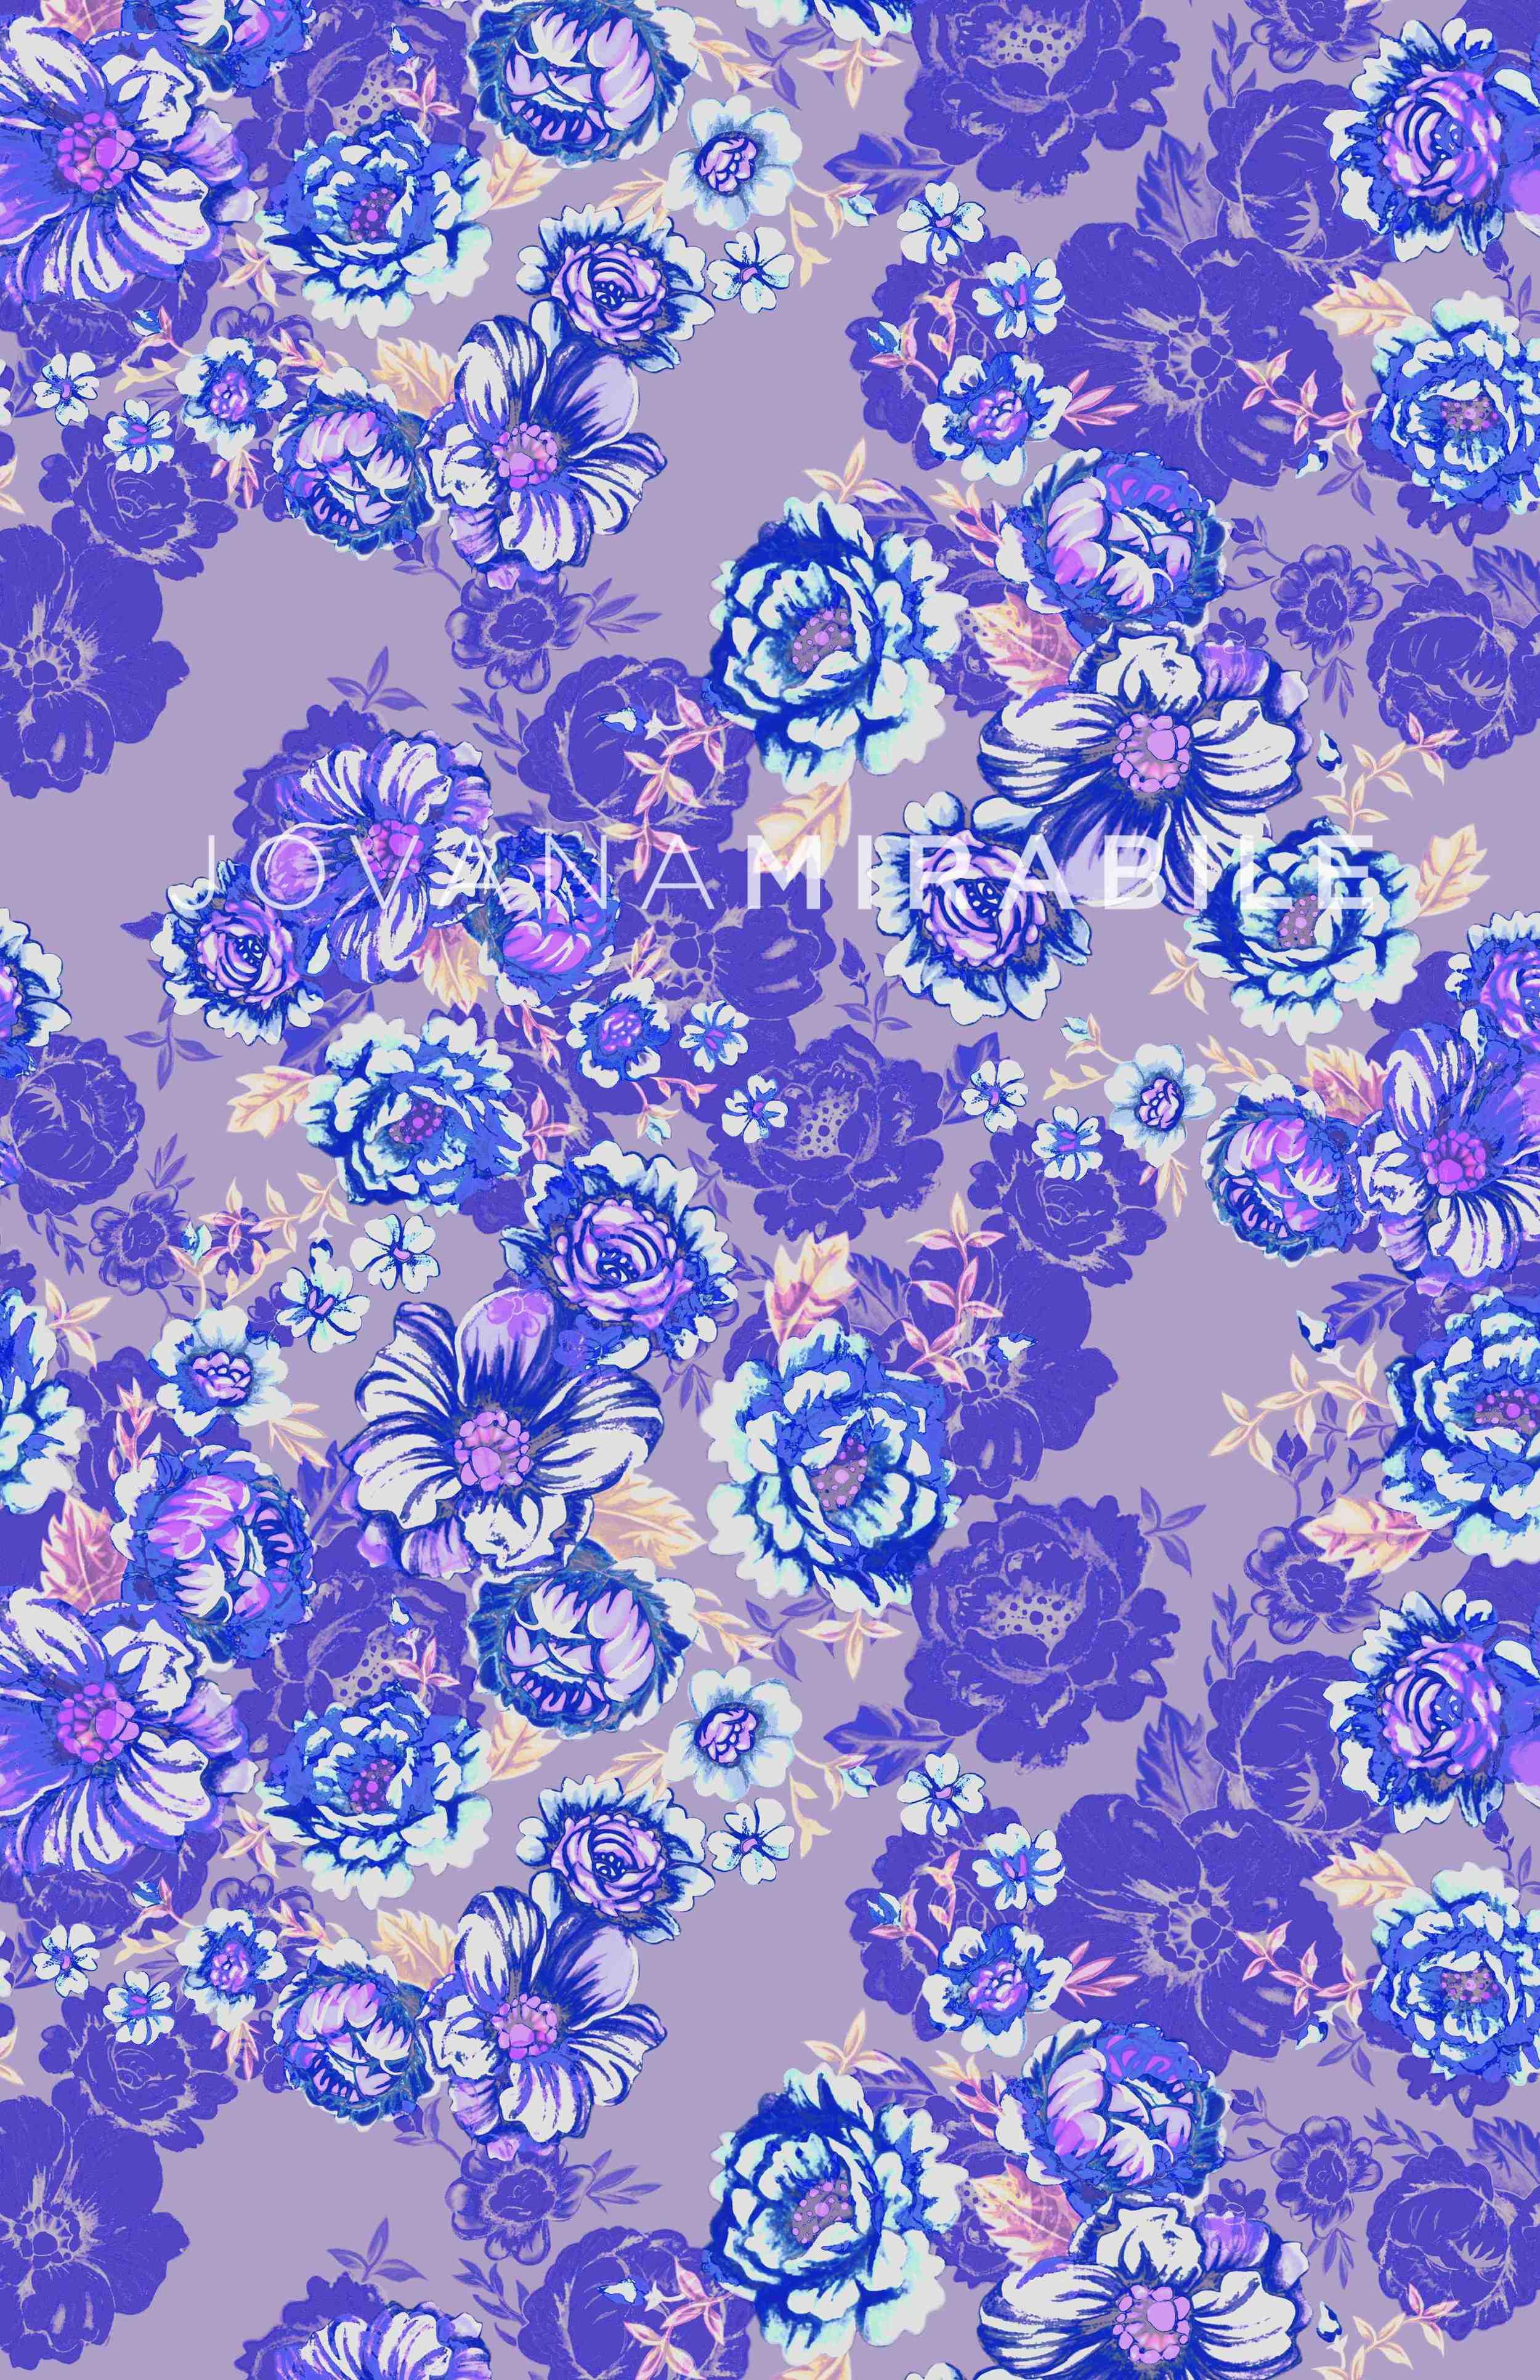 Lavender Blossom.jpg